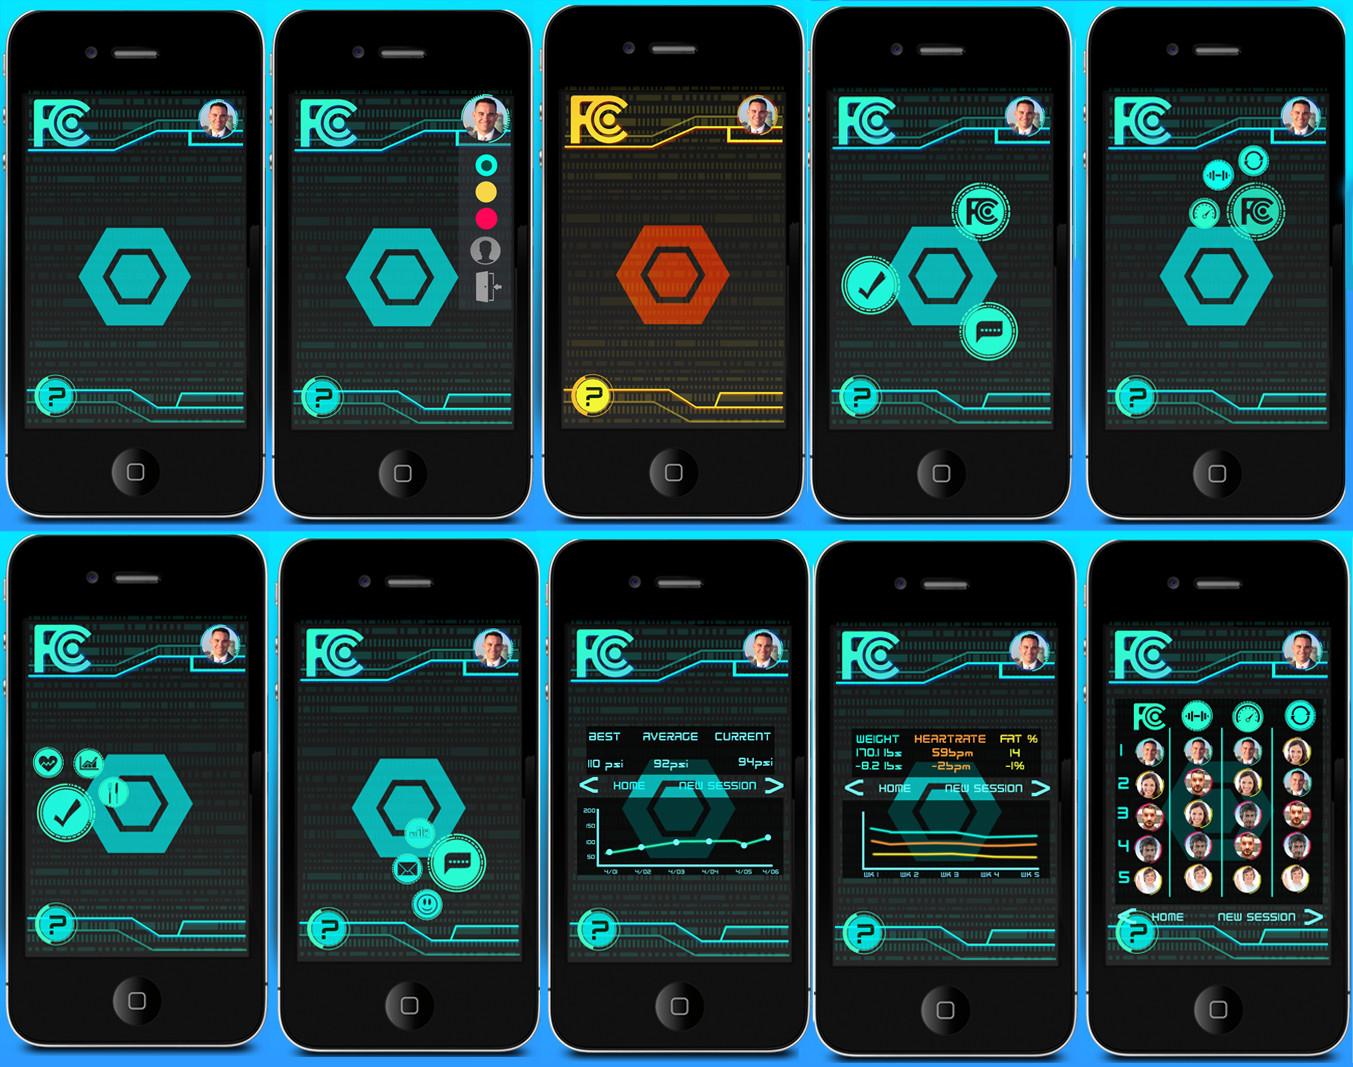 App interface- Futuristic yet user friendly interface.